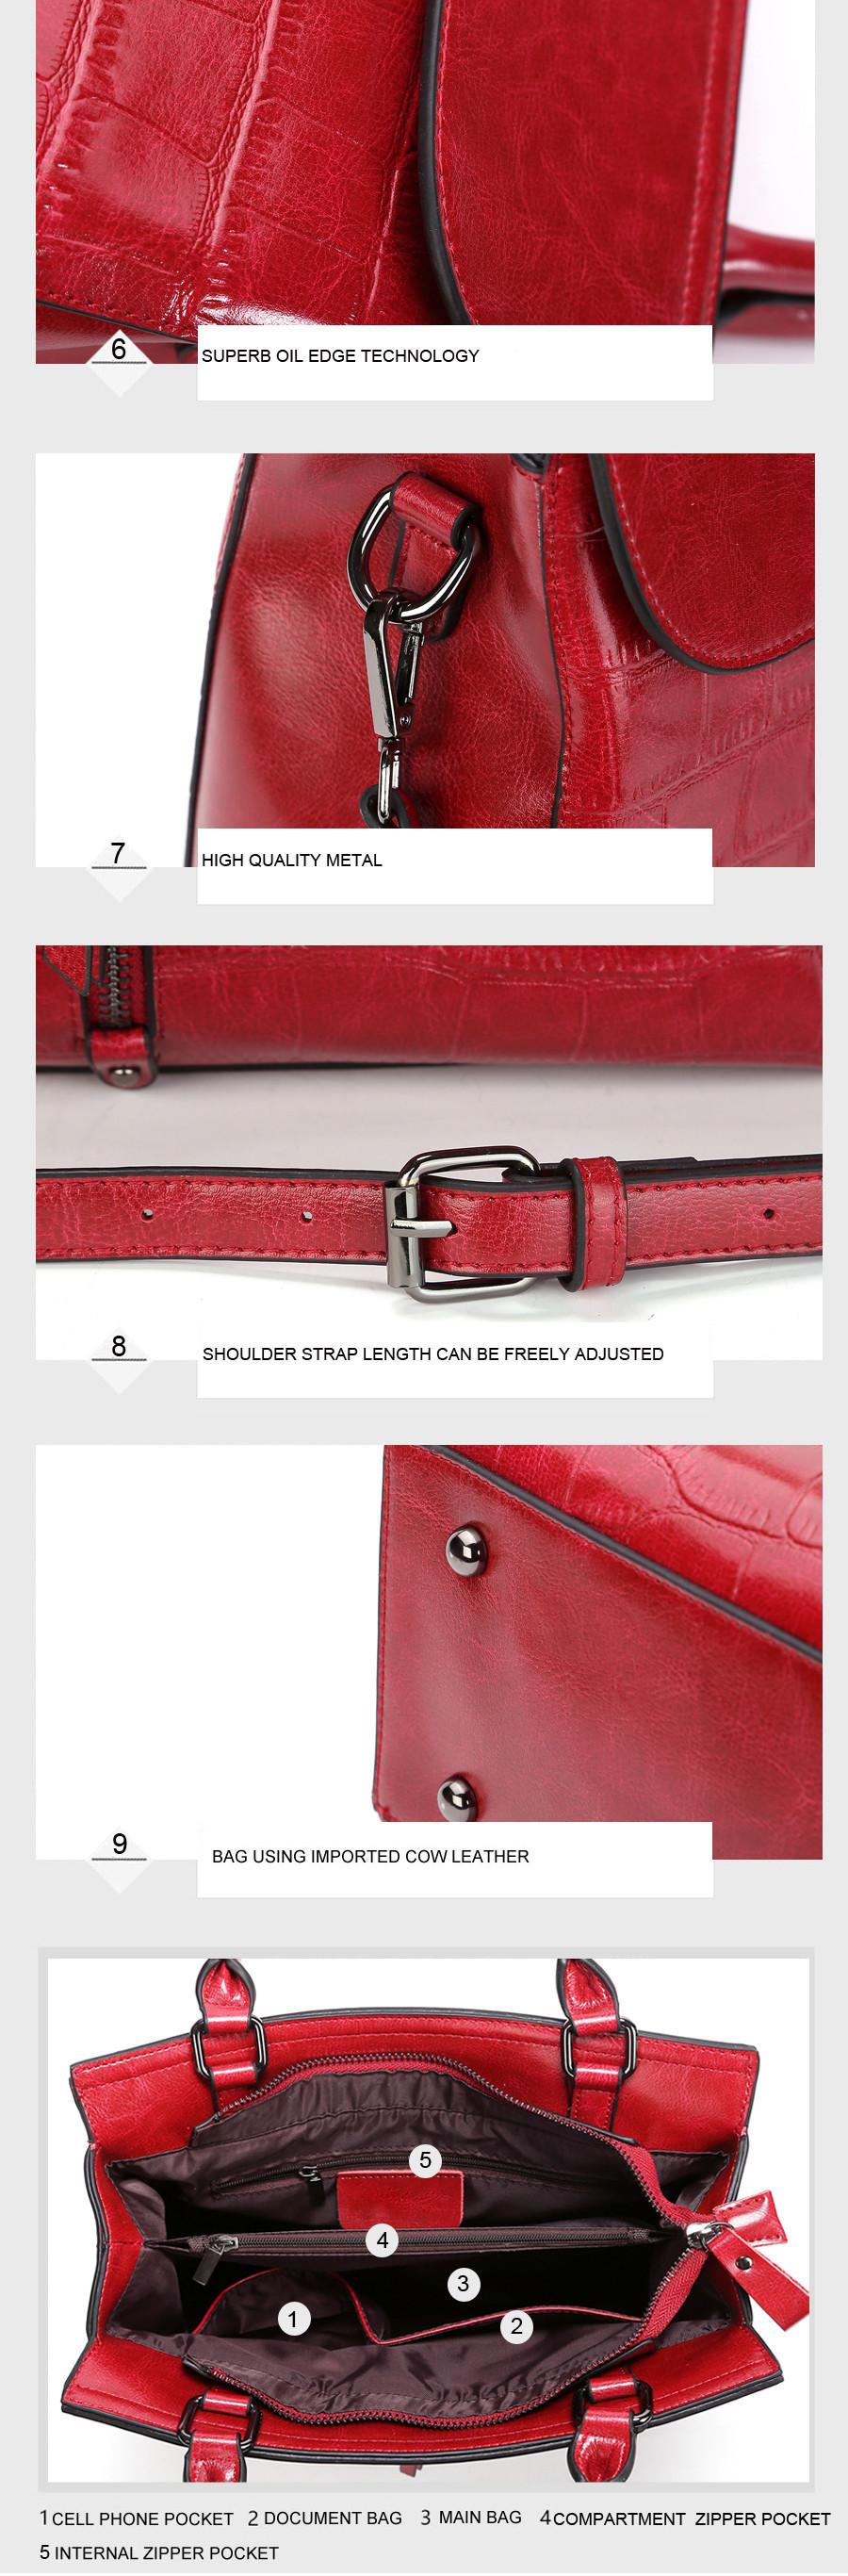 900woman-handbag5_02